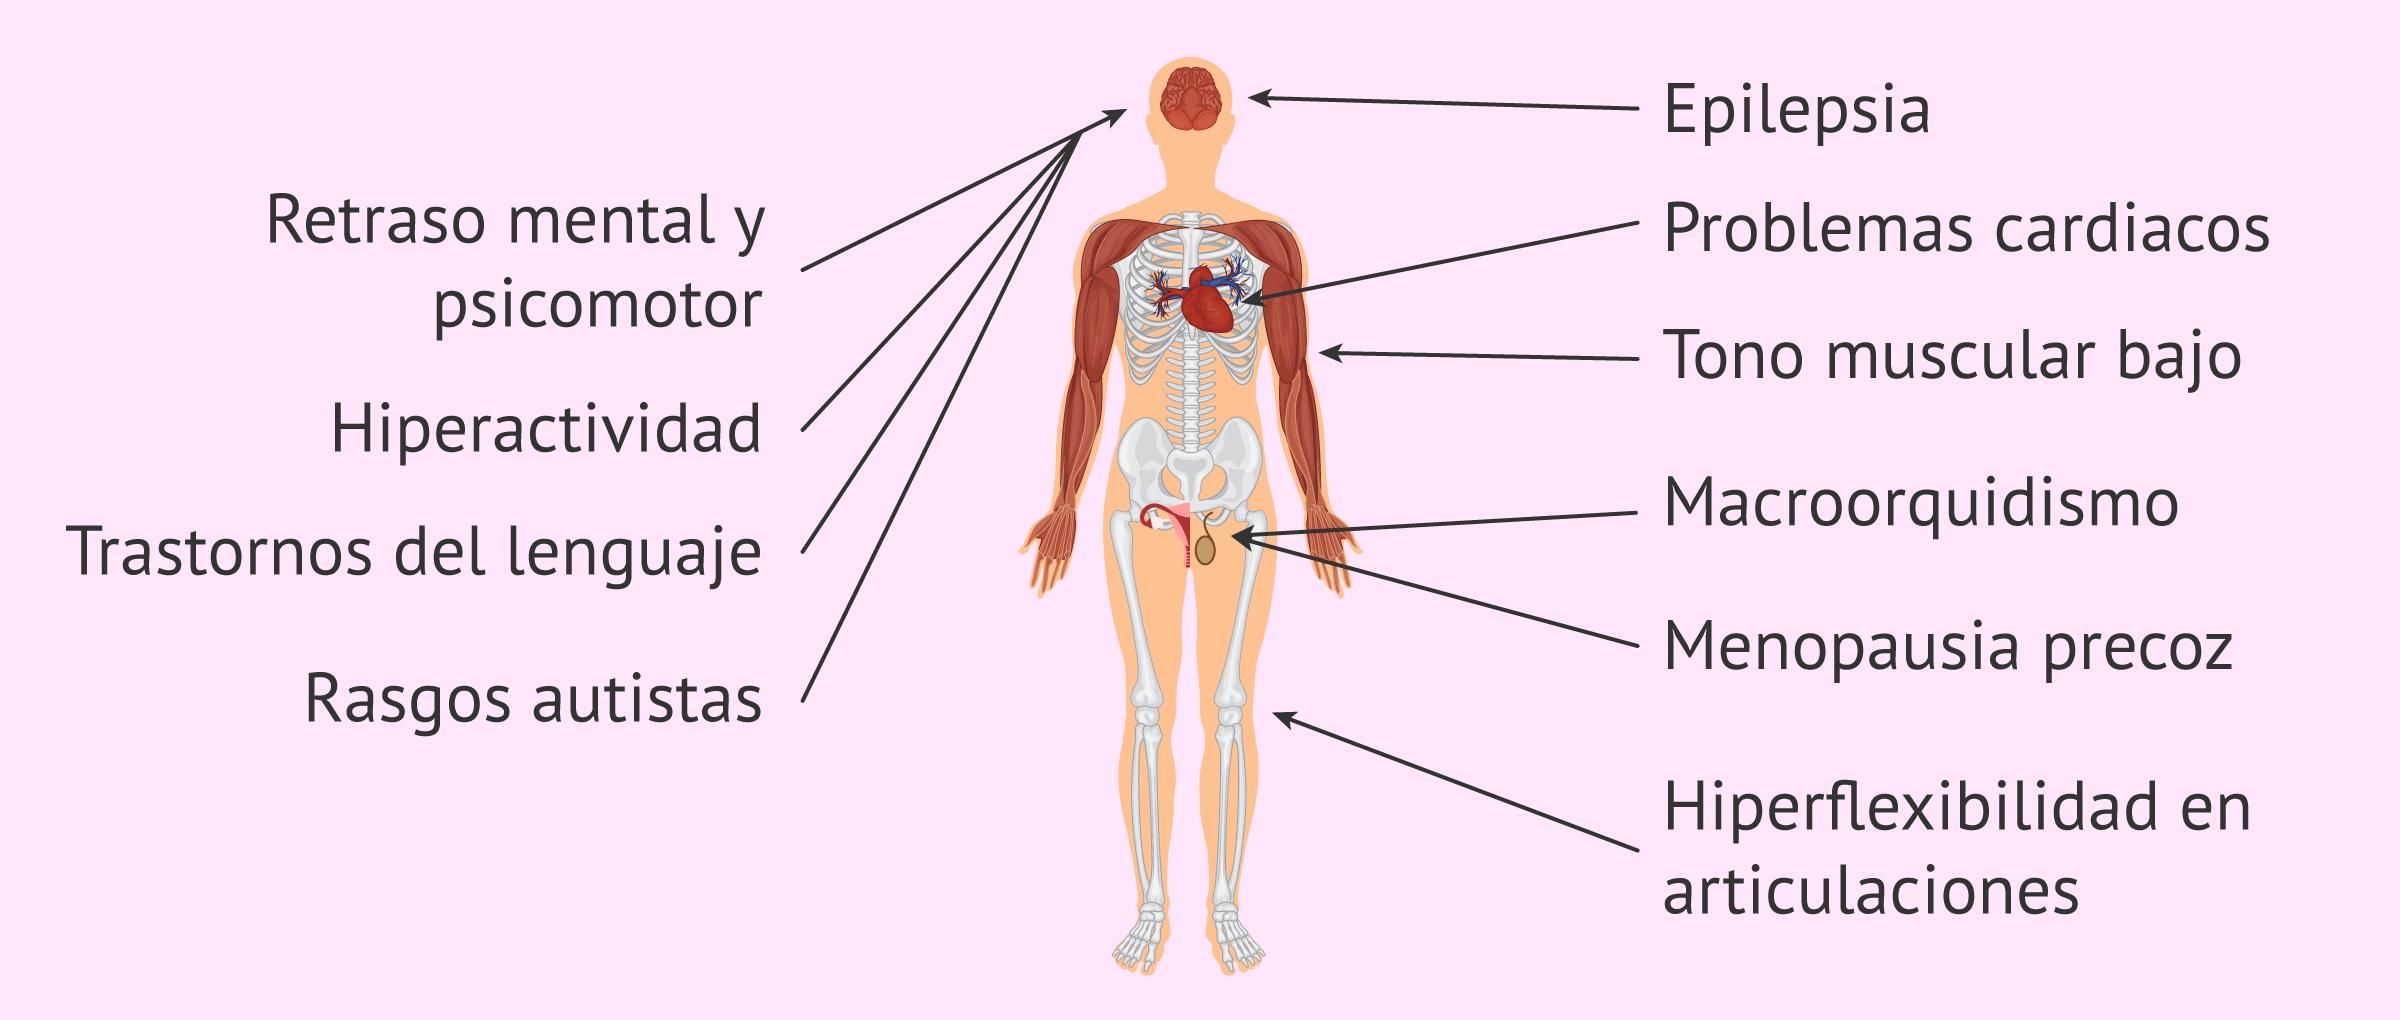 Síndrome X frágil: características